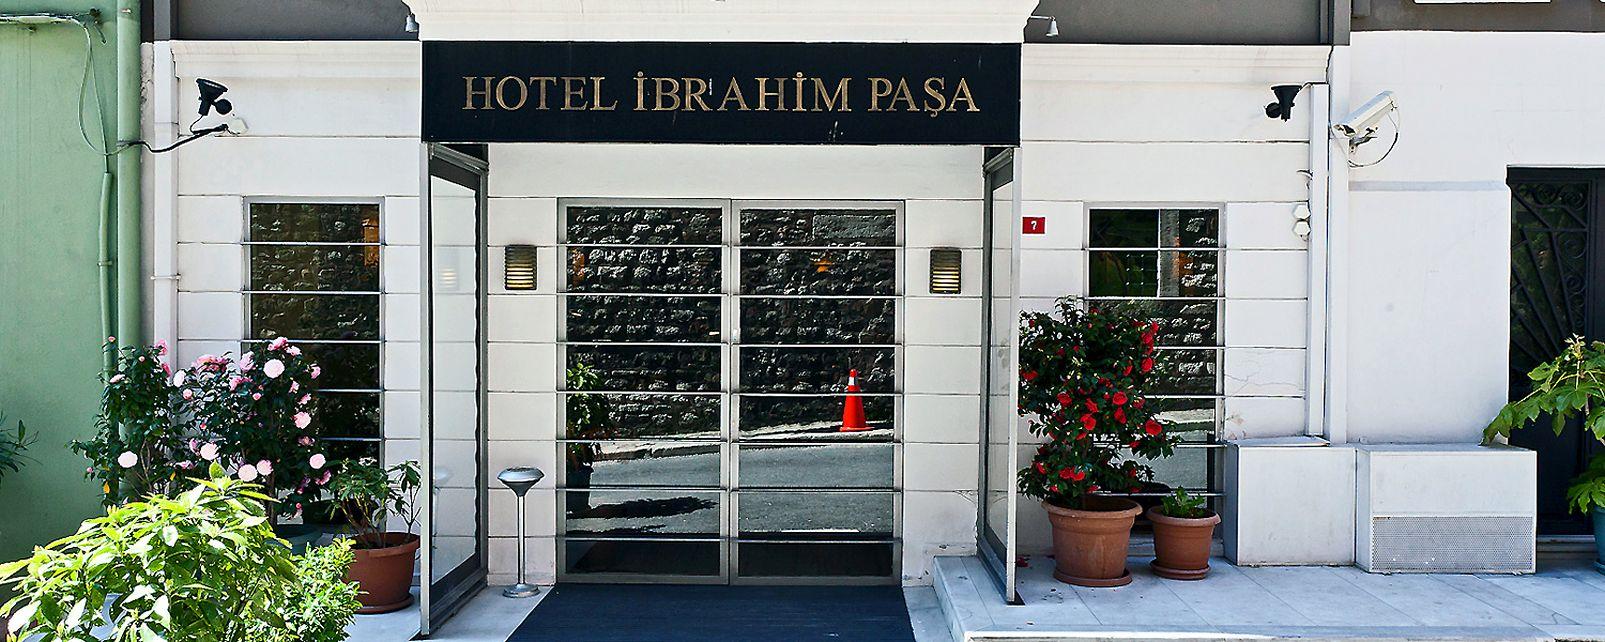 Hôtel Ibrahim Pasa Oteli